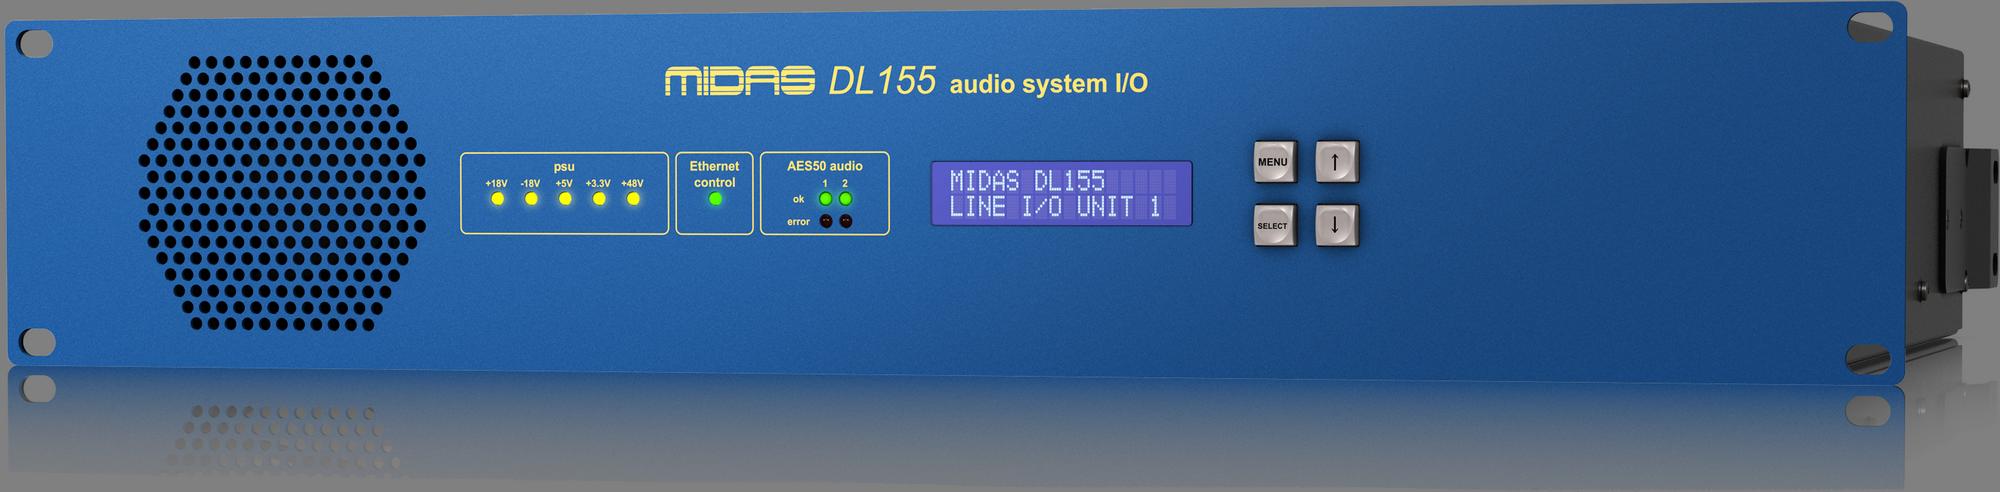 Midas DL155